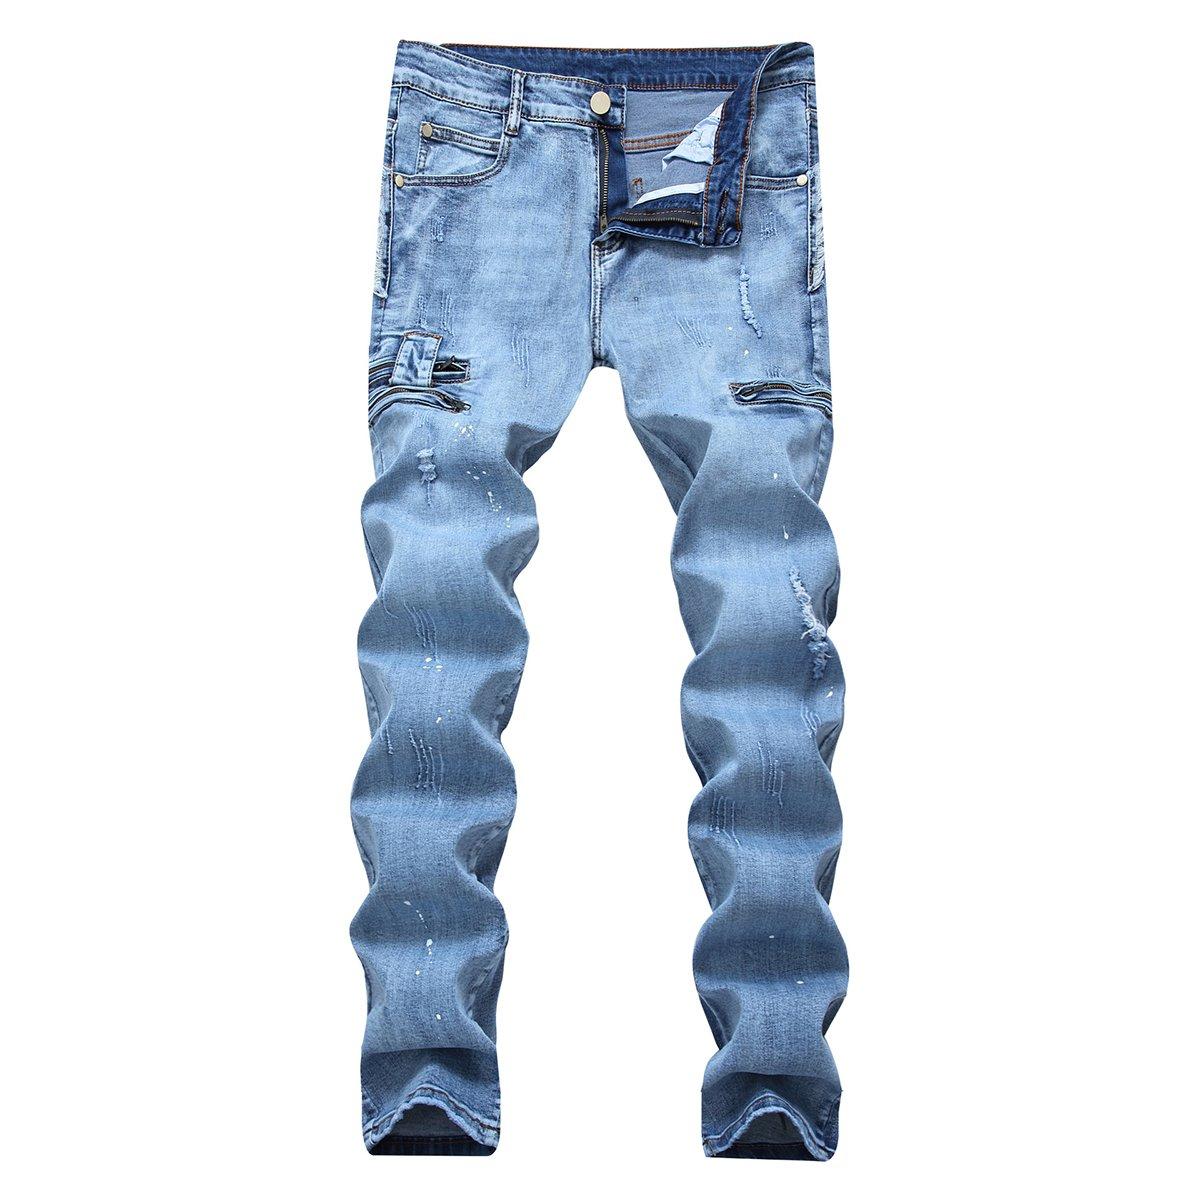 Pishon Men's Ripped Jeans Black Stretch Slim Distressed Straight Leg Biker Jeans, Light Blue, 28